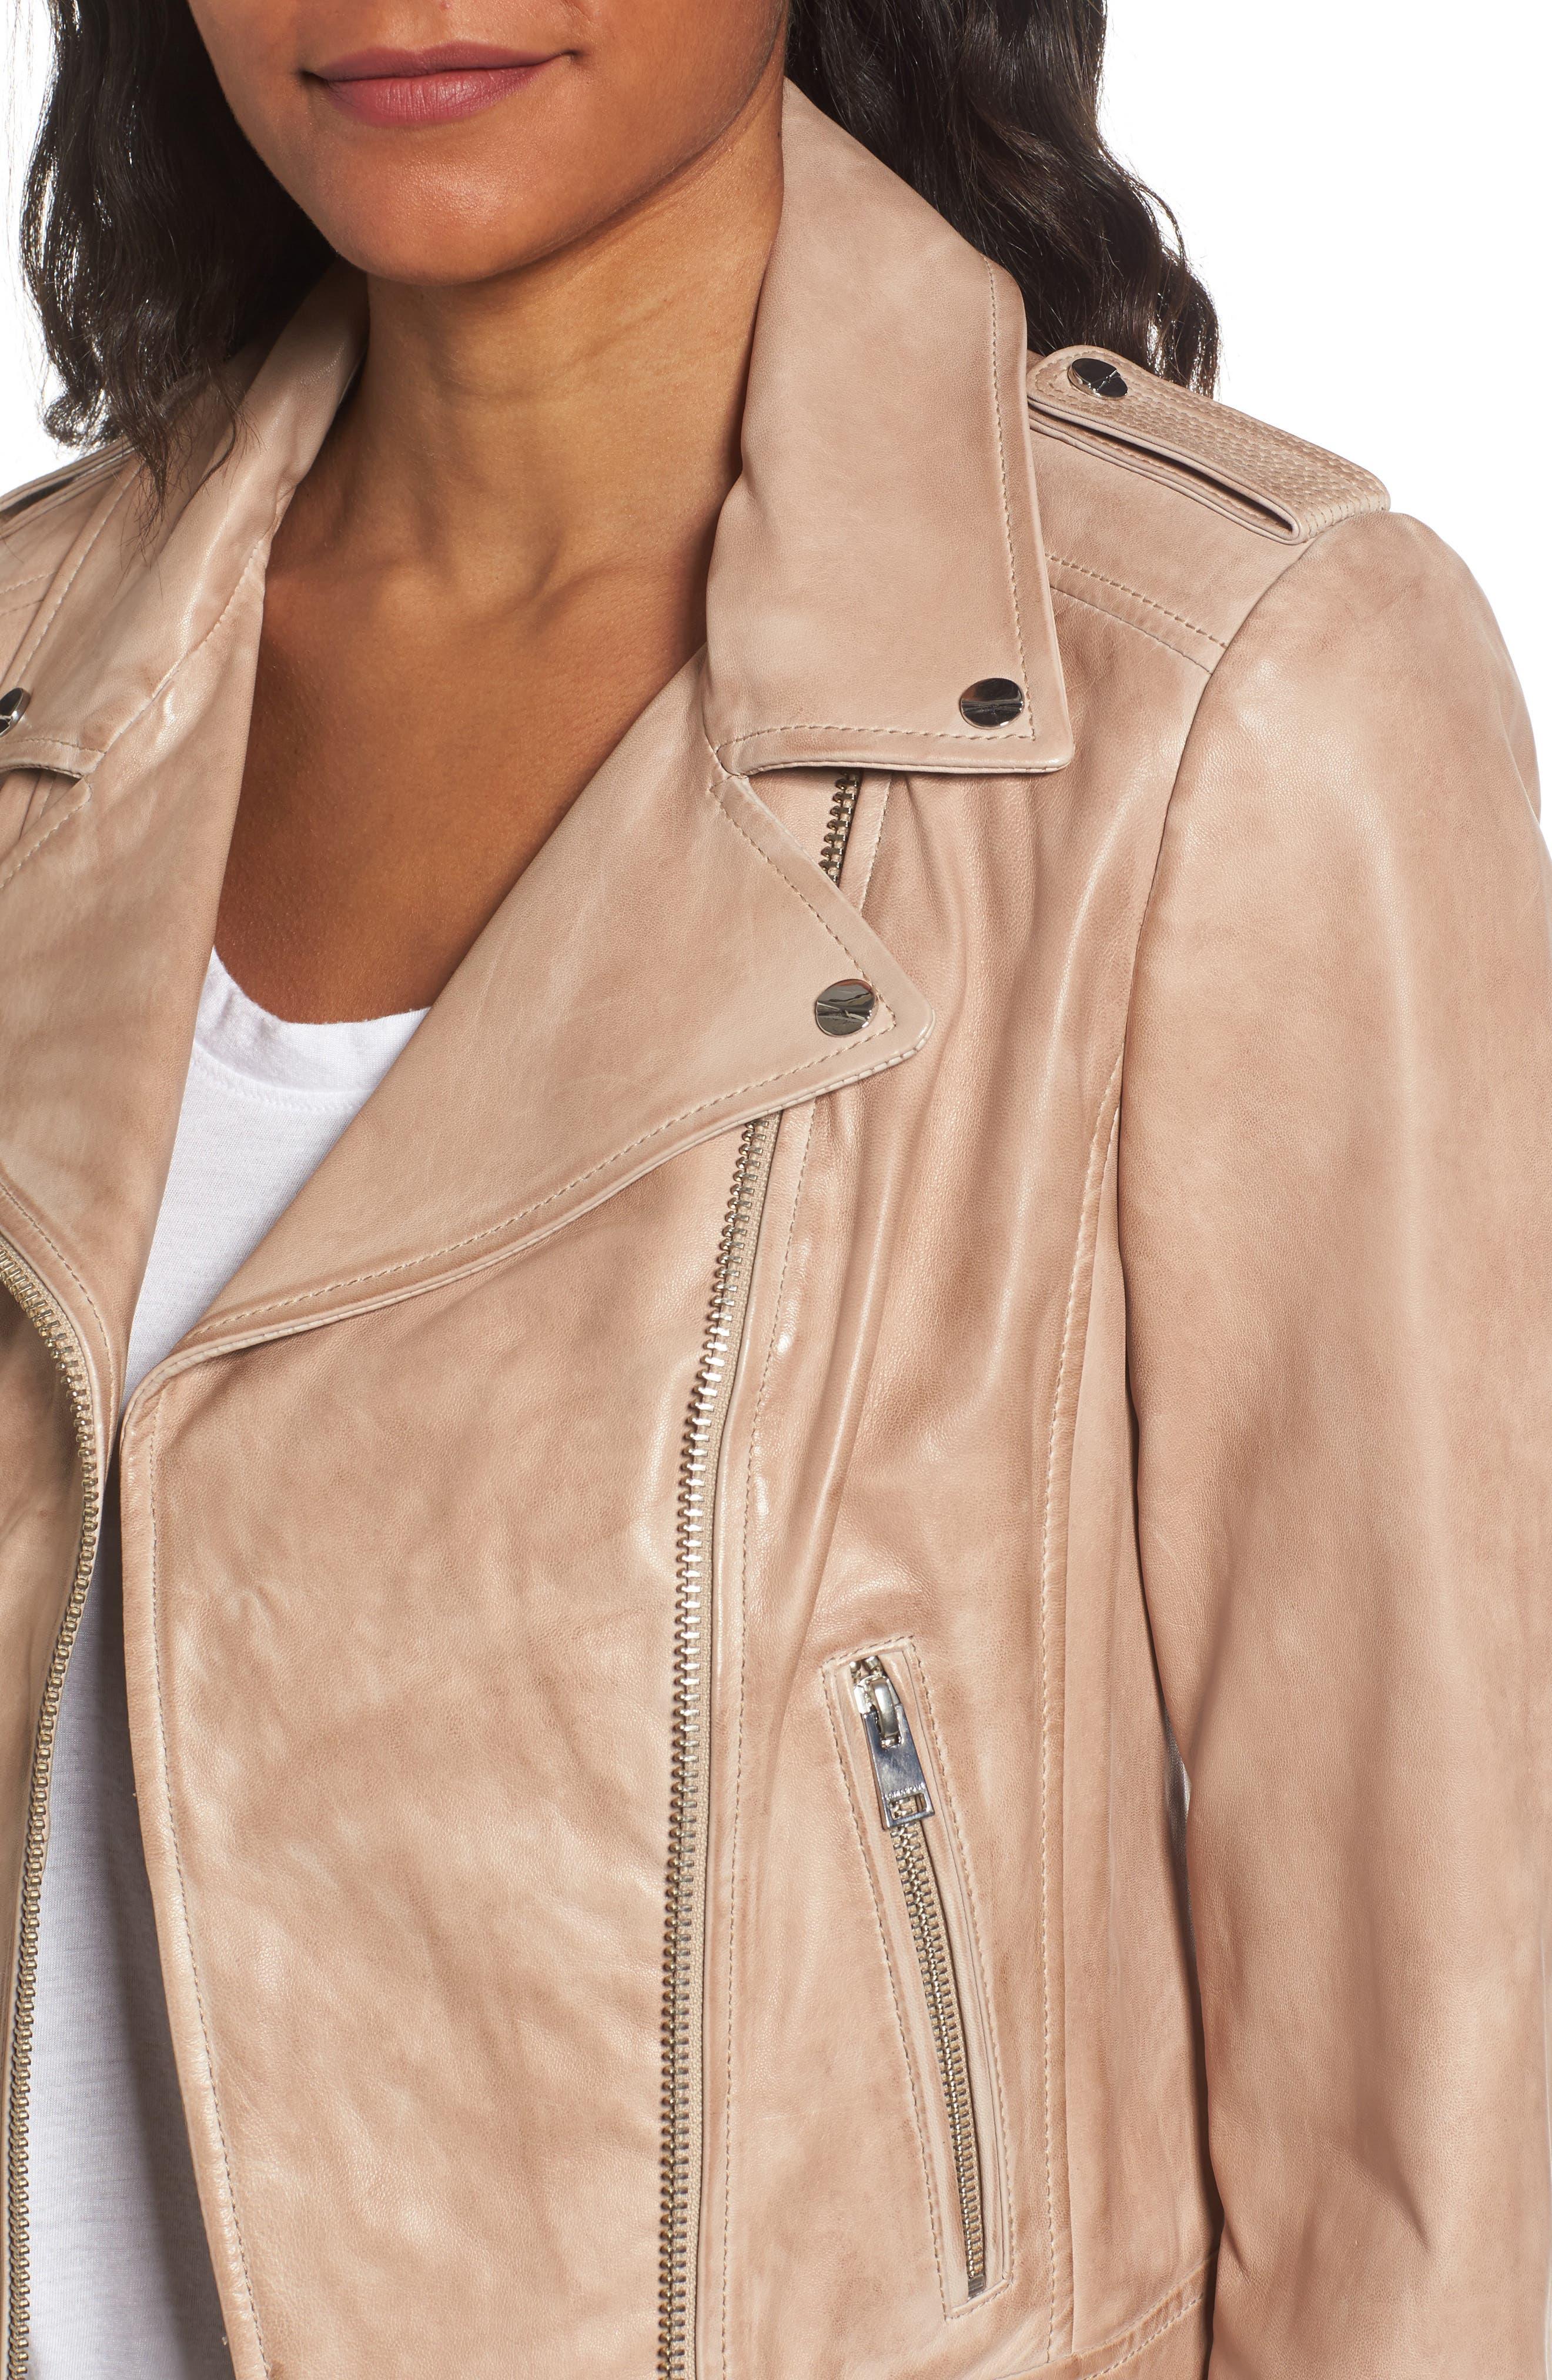 Donna Lambskin Leather Moto Jacket,                             Alternate thumbnail 4, color,                             253